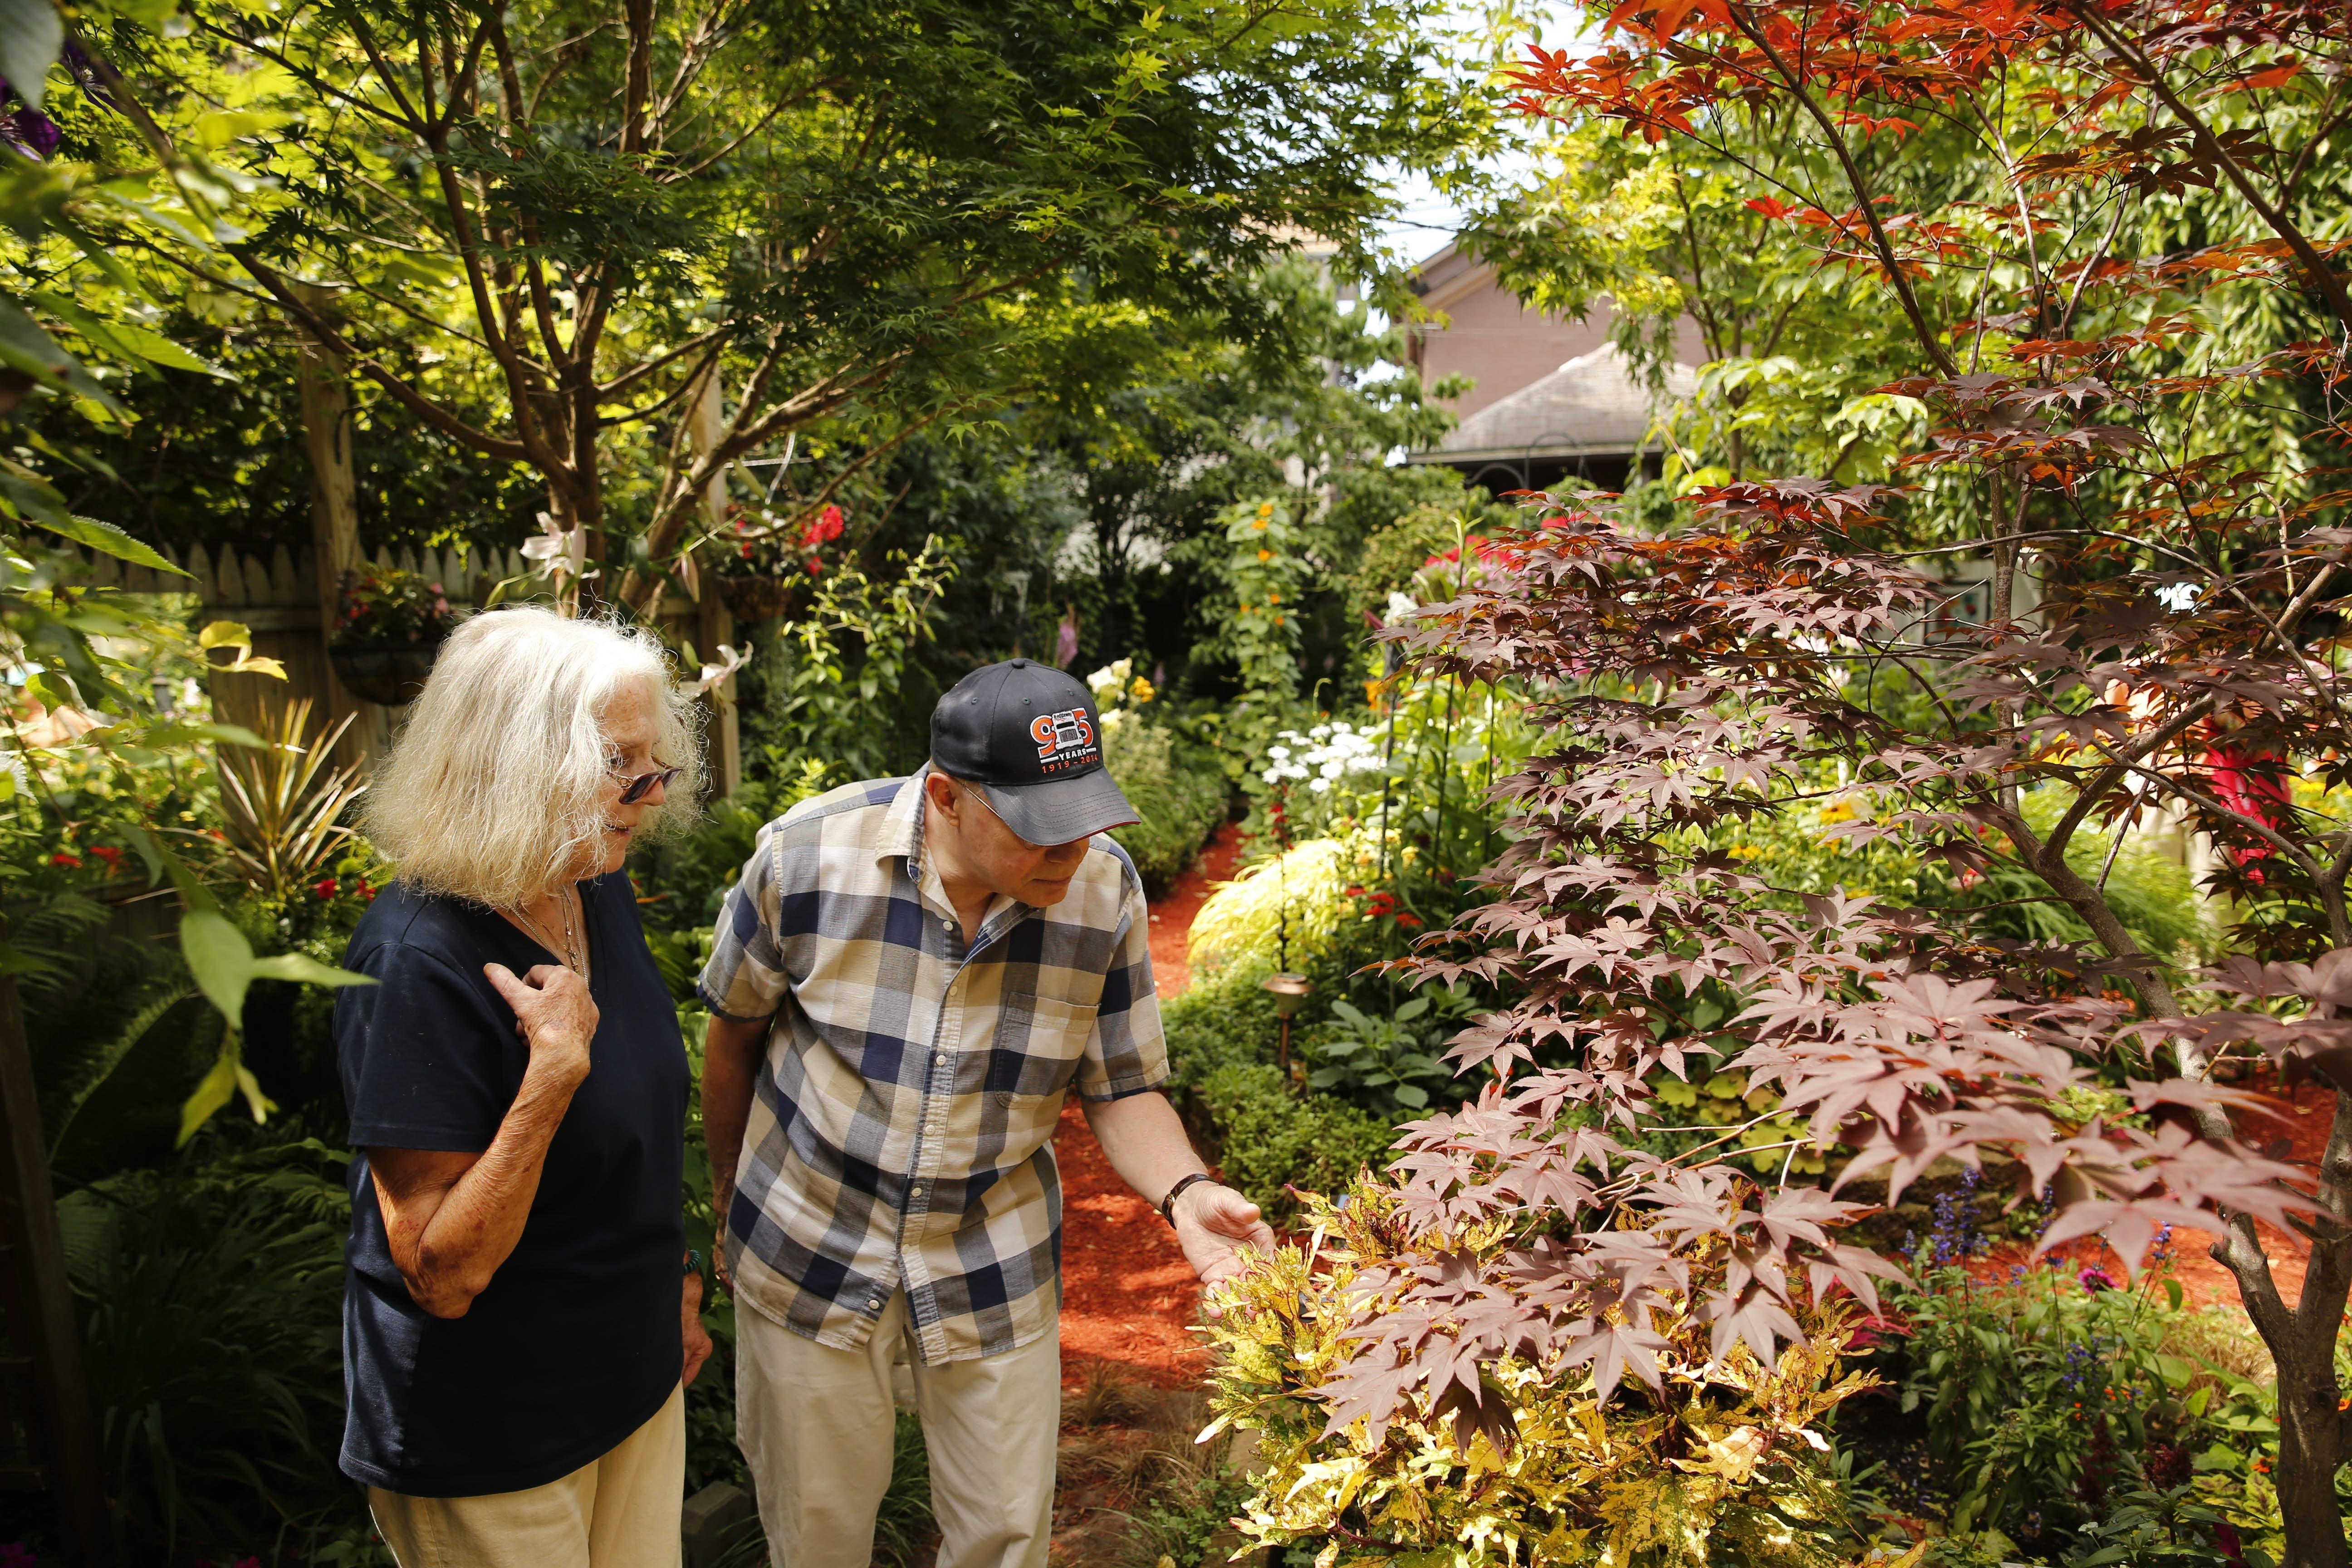 Neighbor Edith Bartlett and David Krellner tour the garden of Jim Ecker on Johnson Park during last year's Garden Walk.  (Derek Gee/Buffalo News)